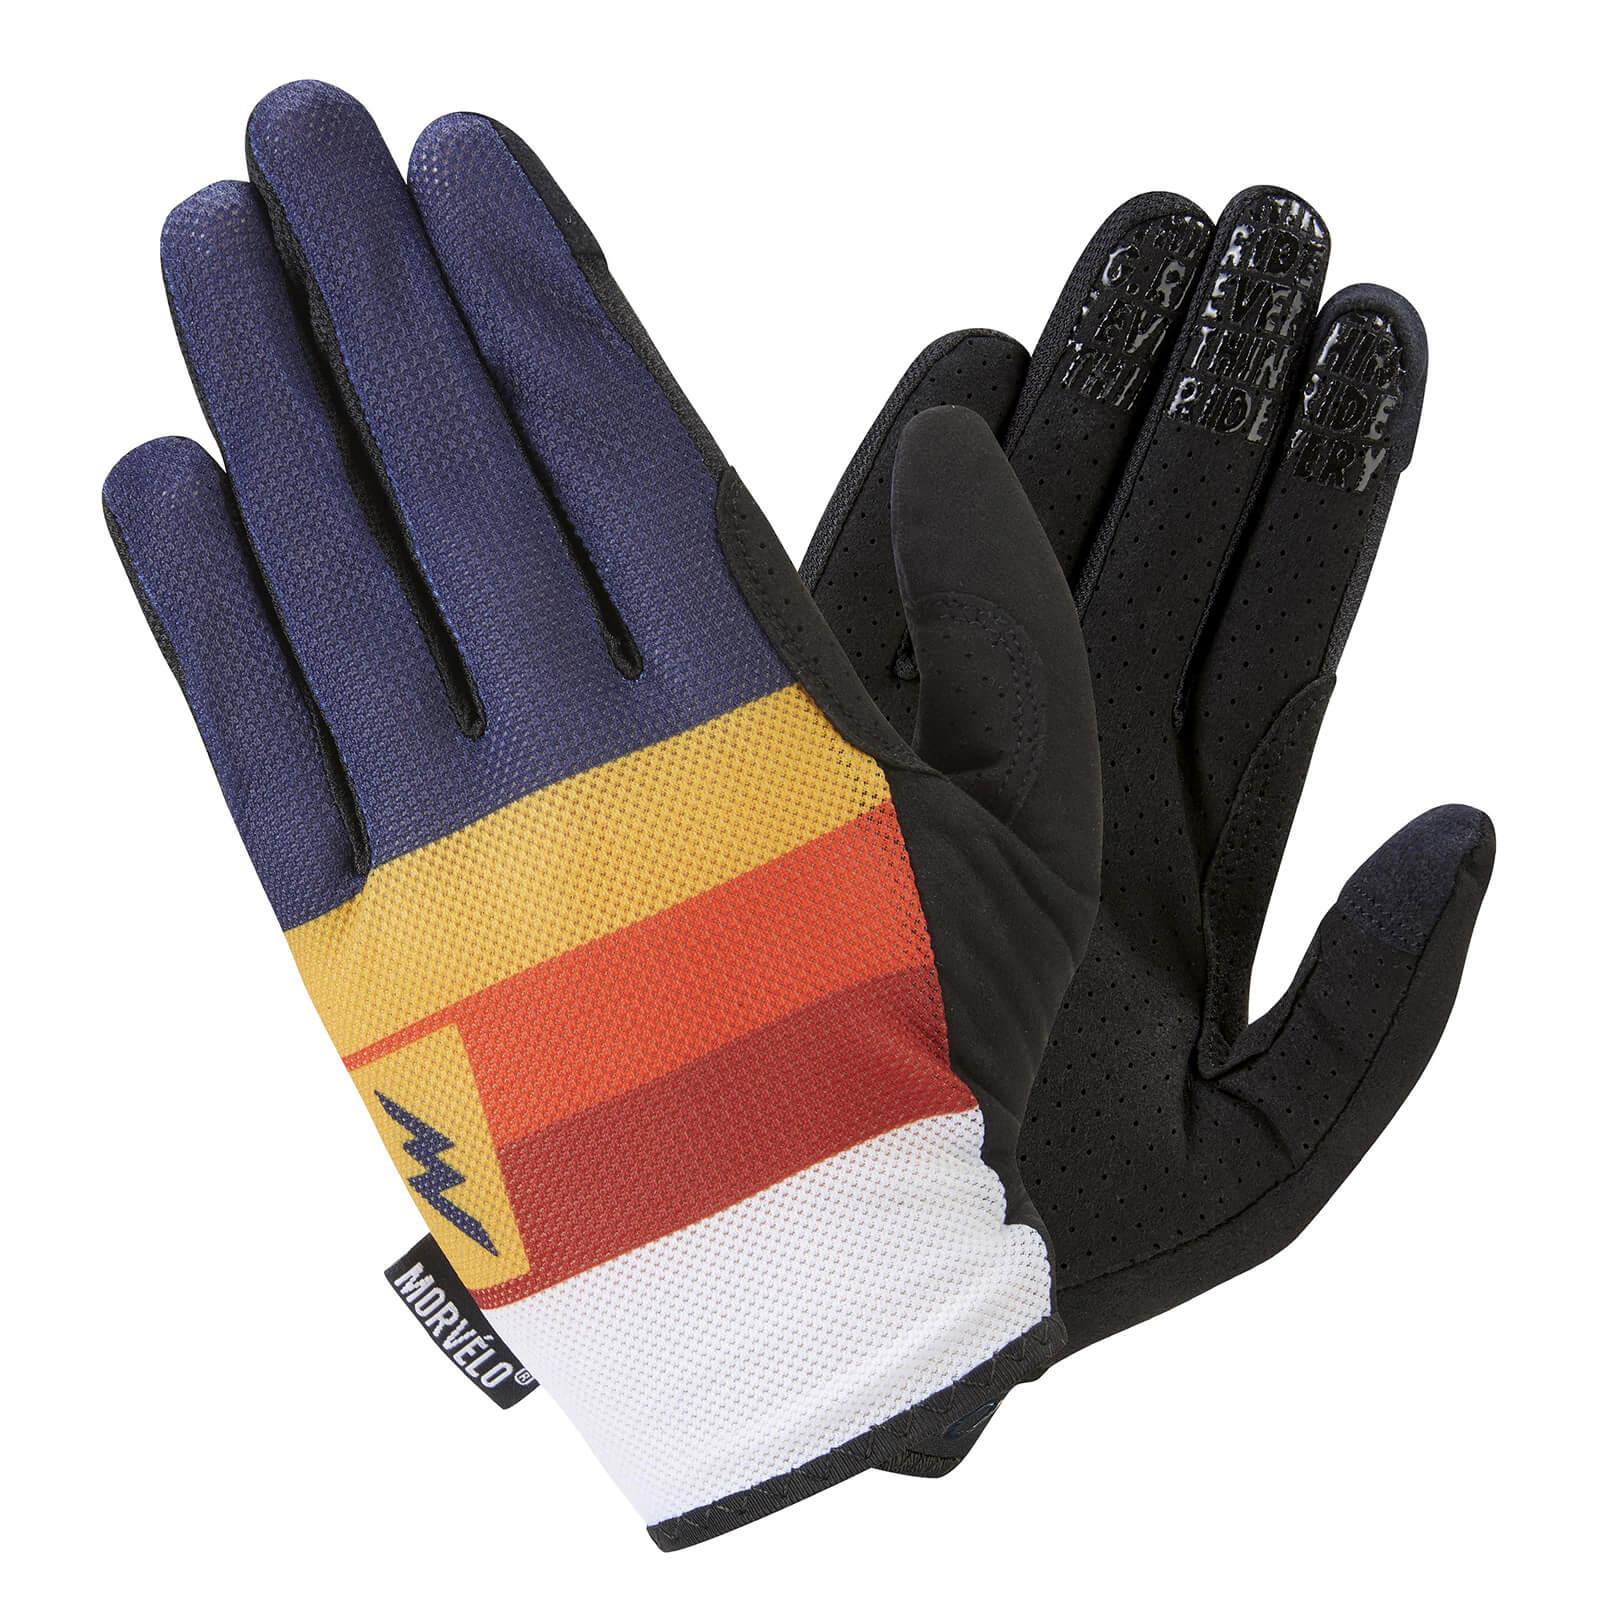 Morvelo Daytona Gloves - XL